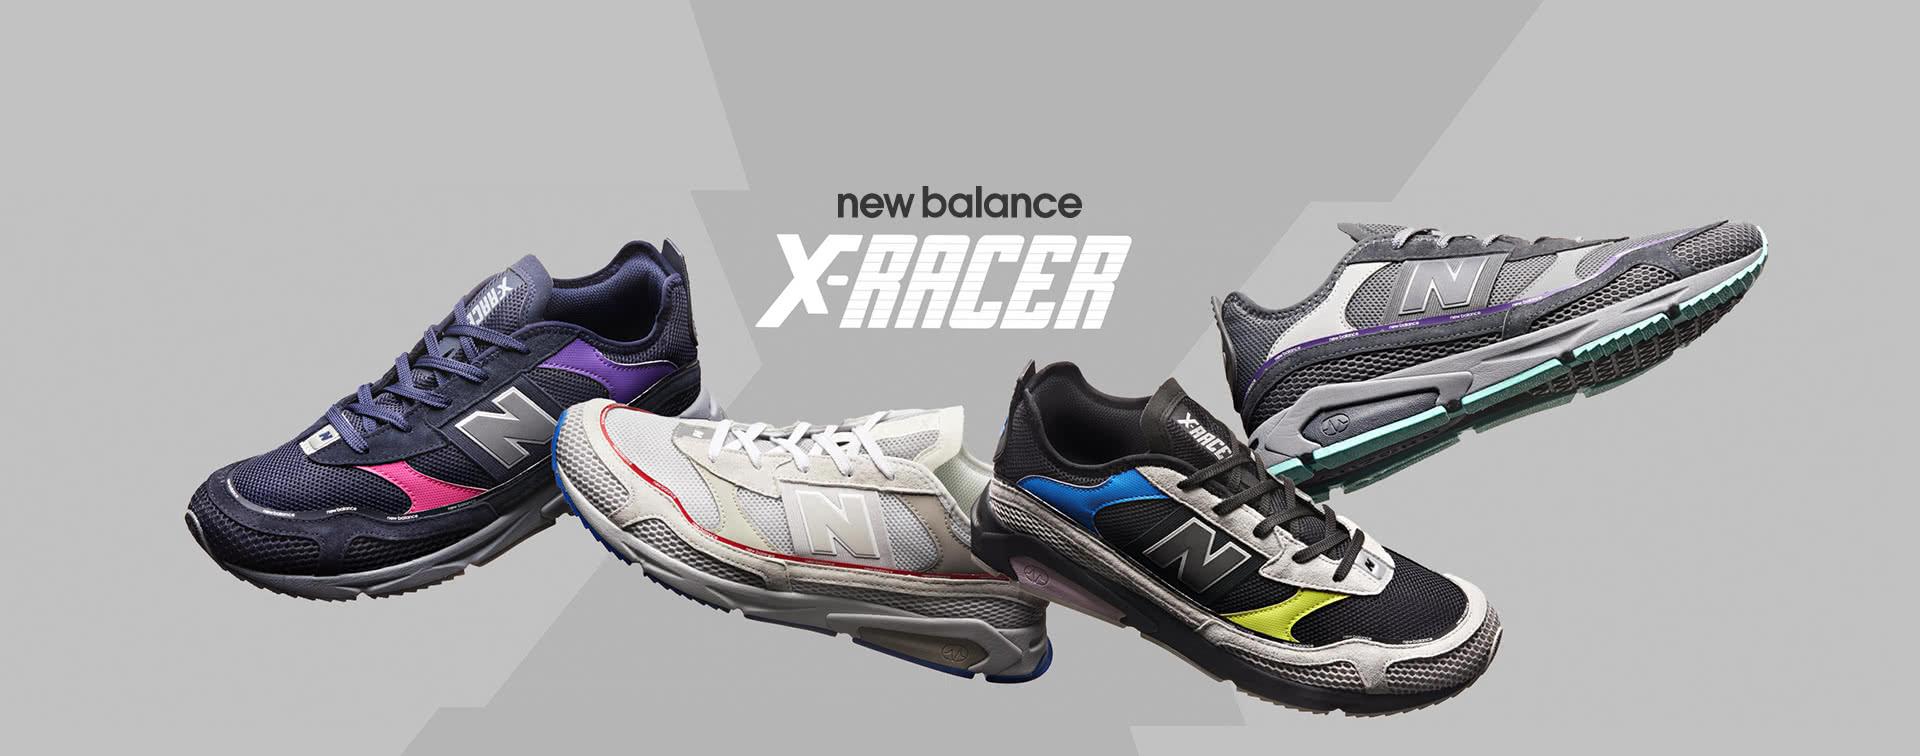 NewBalance Xracer